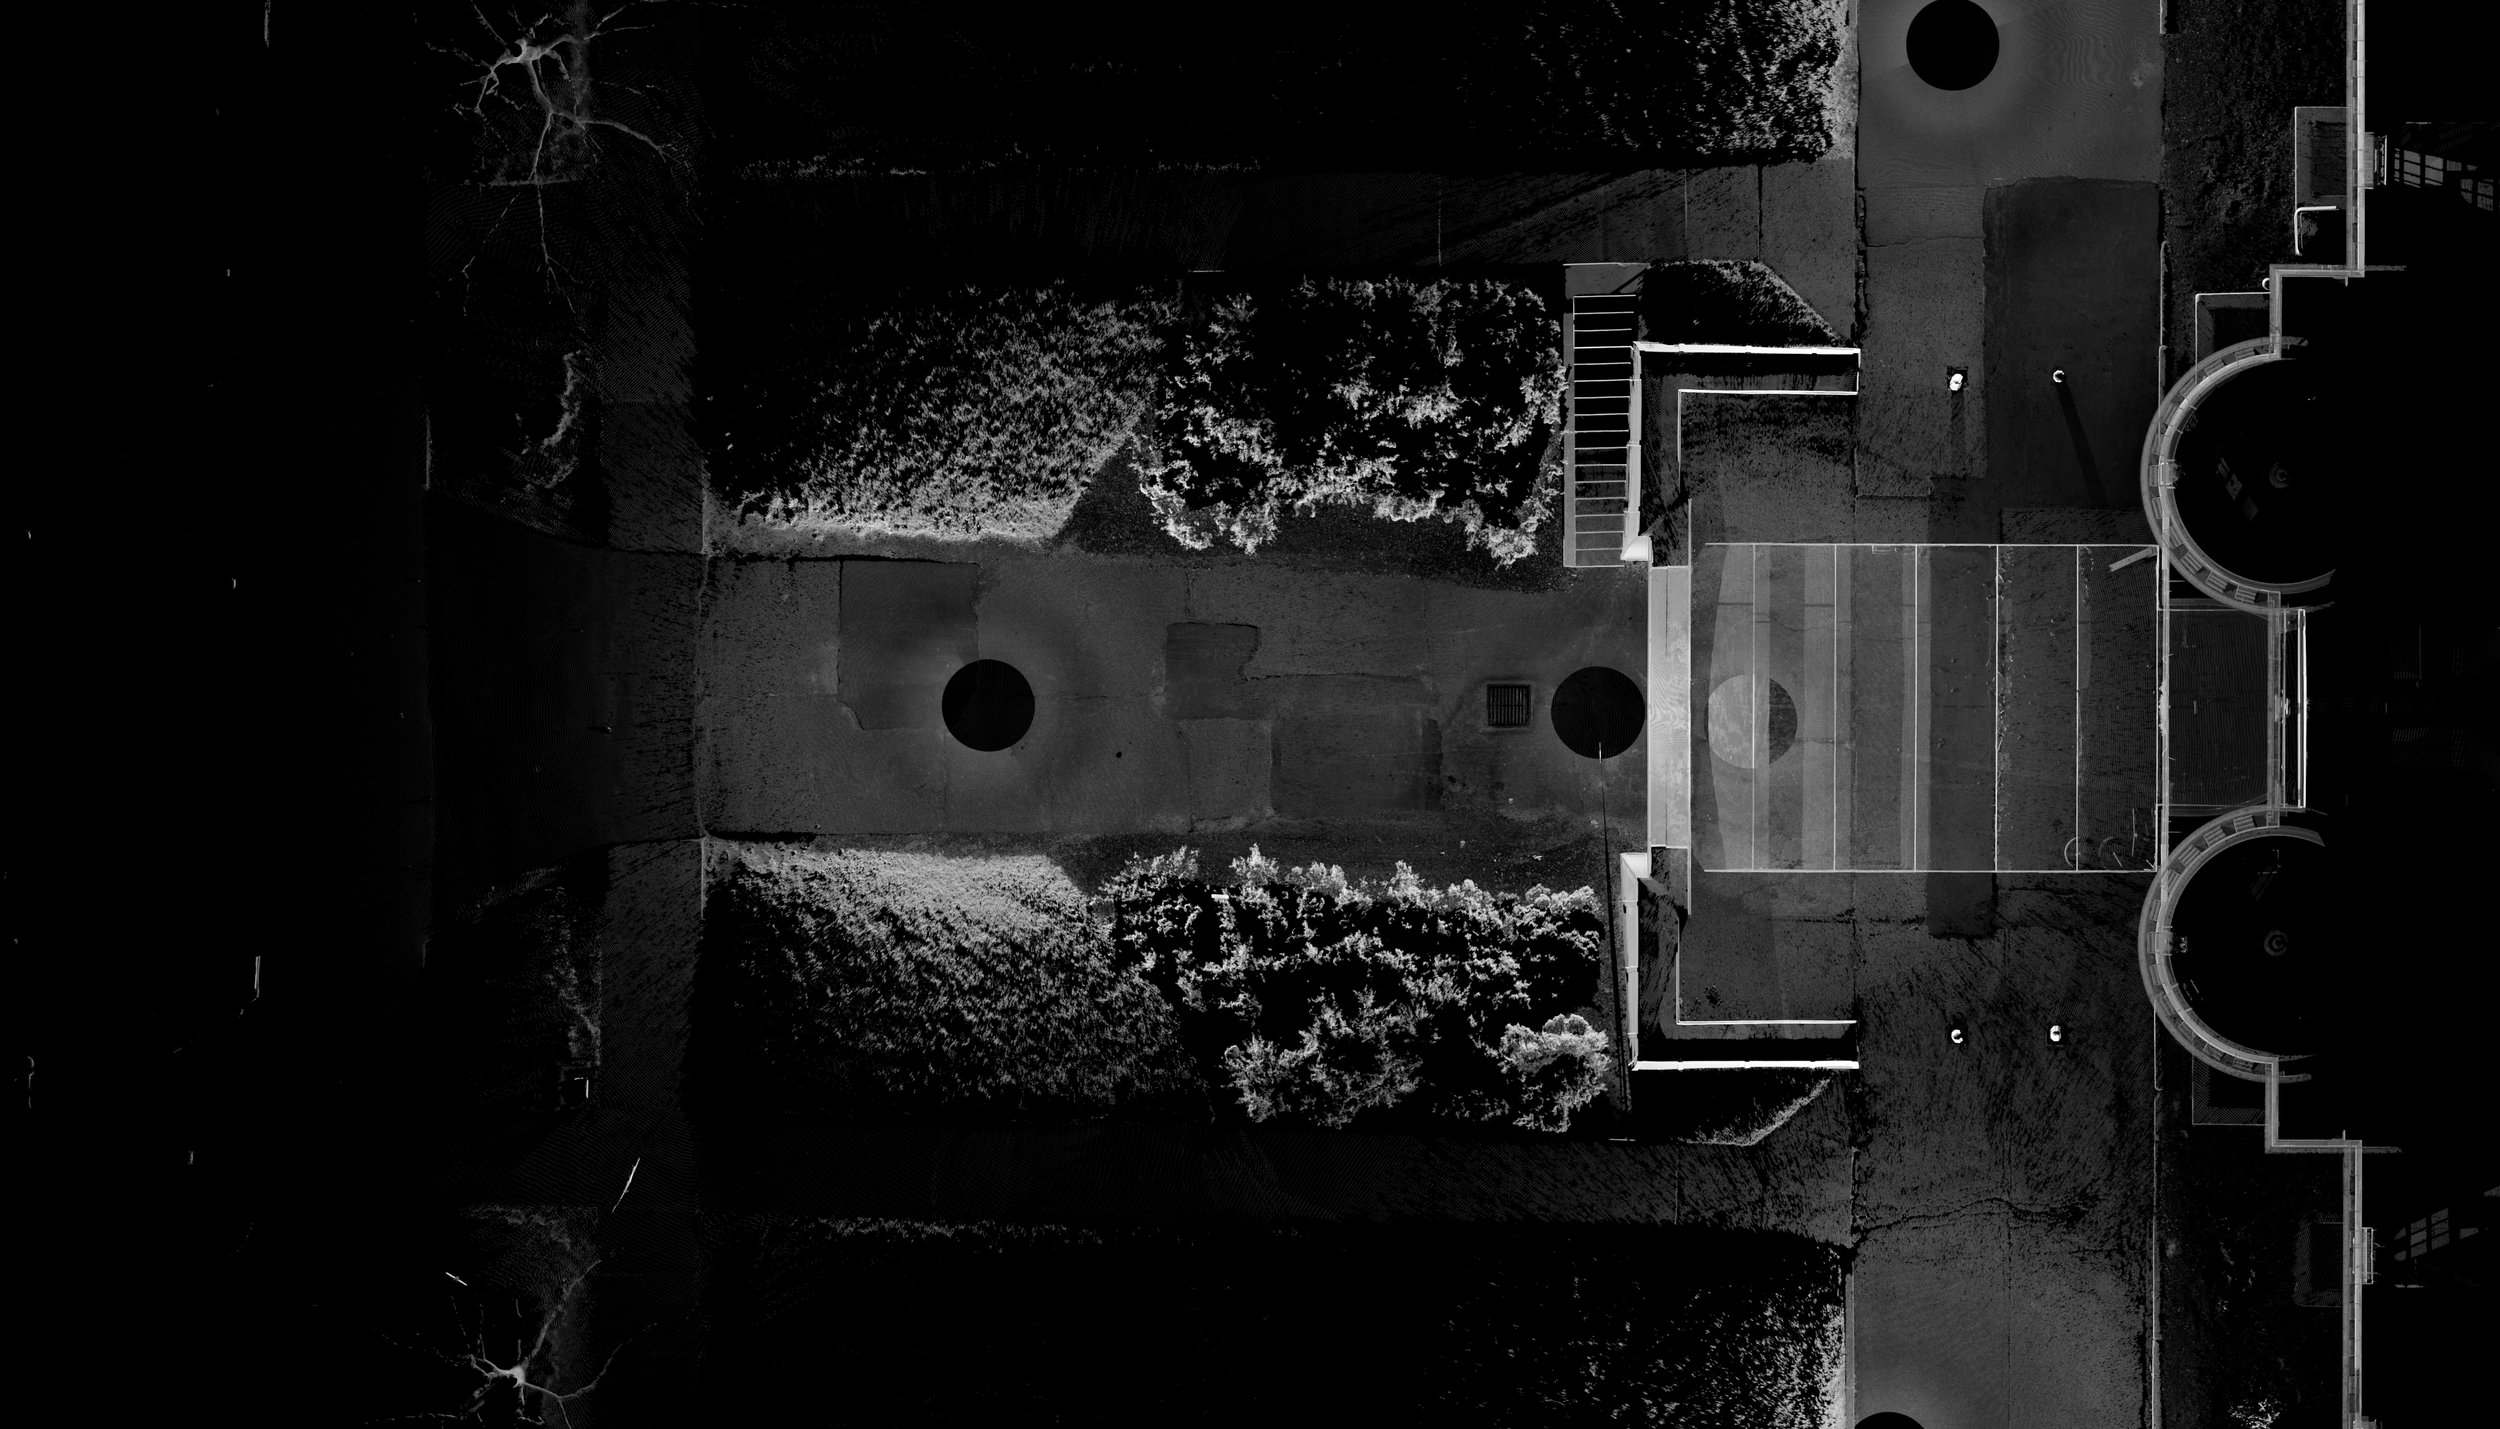 MYNDWORKSHOP_rensselaer-polytechnic-institute-3D-laser-scanning-point-cloud-new-york-ARMORY-3.jpg